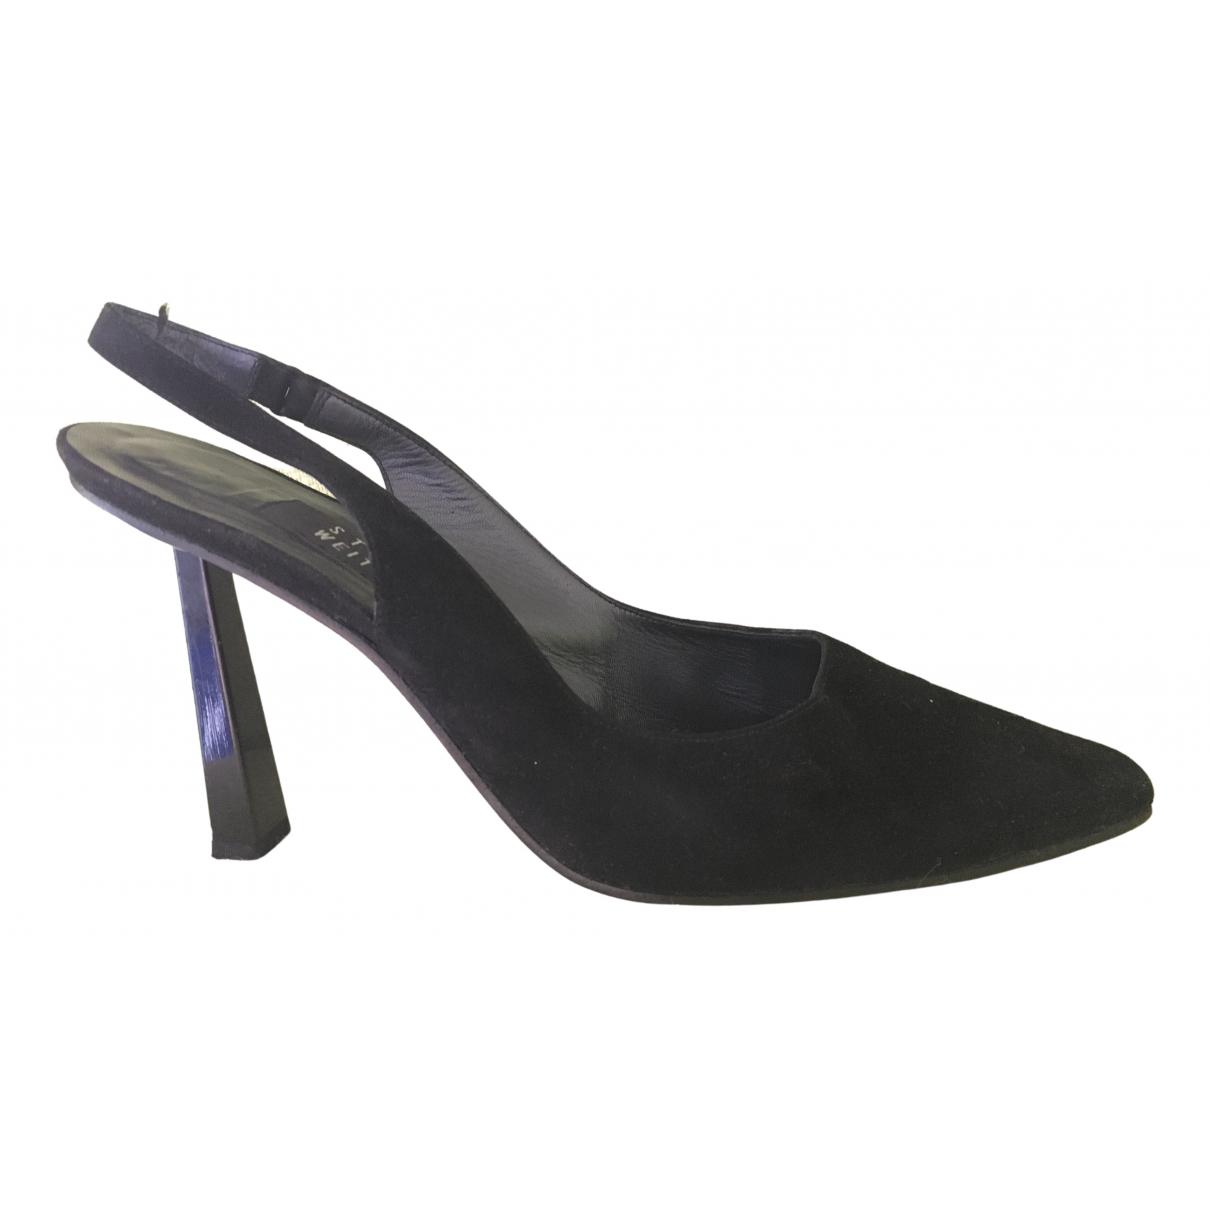 Stuart Weitzman \N Black Leather Heels for Women 10 US